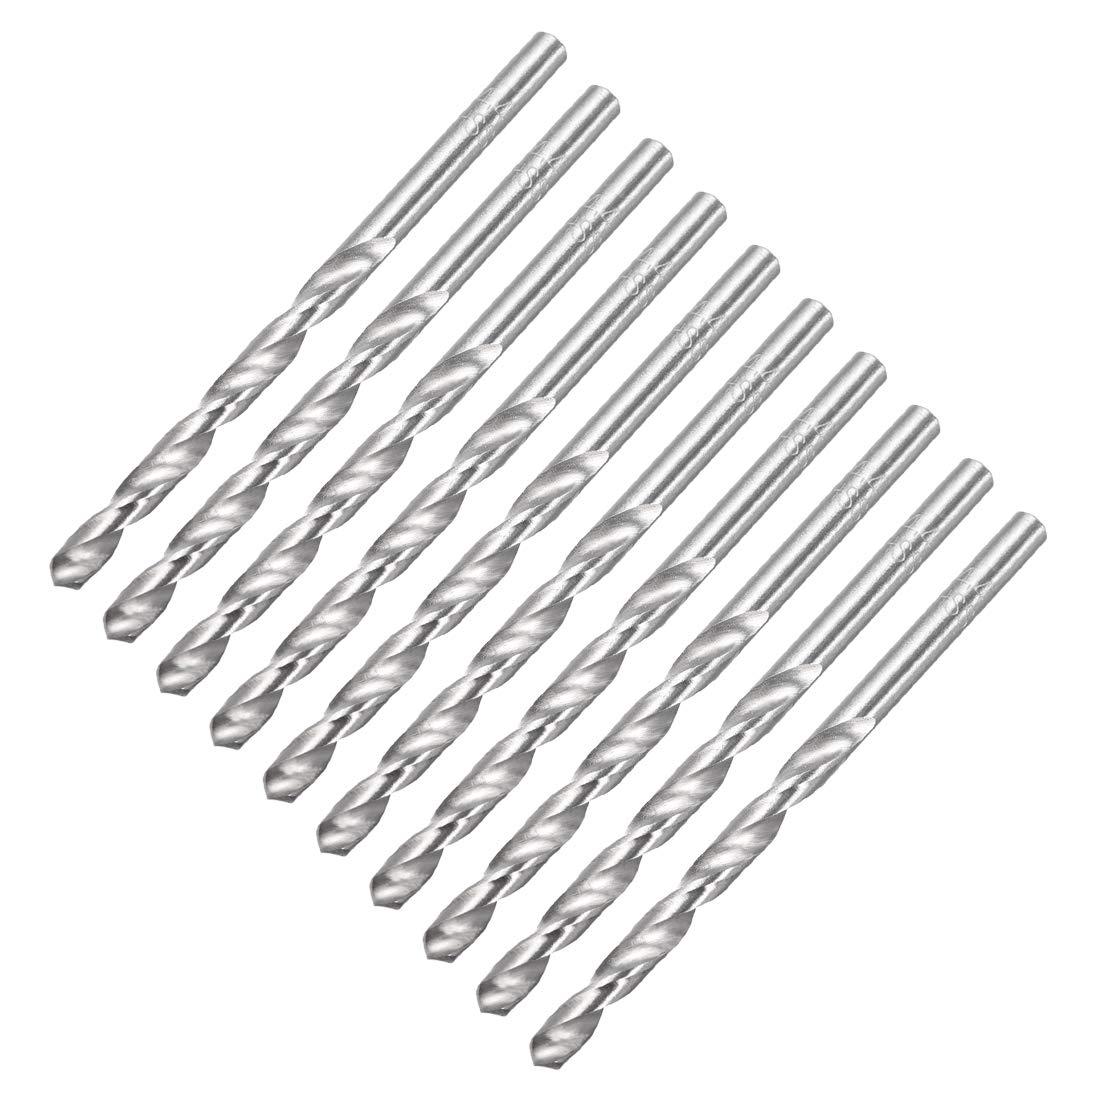 uxcell 3.9mm Twist Drill High Speed Steel Bit HSS-4241 for Steel,Aluminum Alloy 10pcs